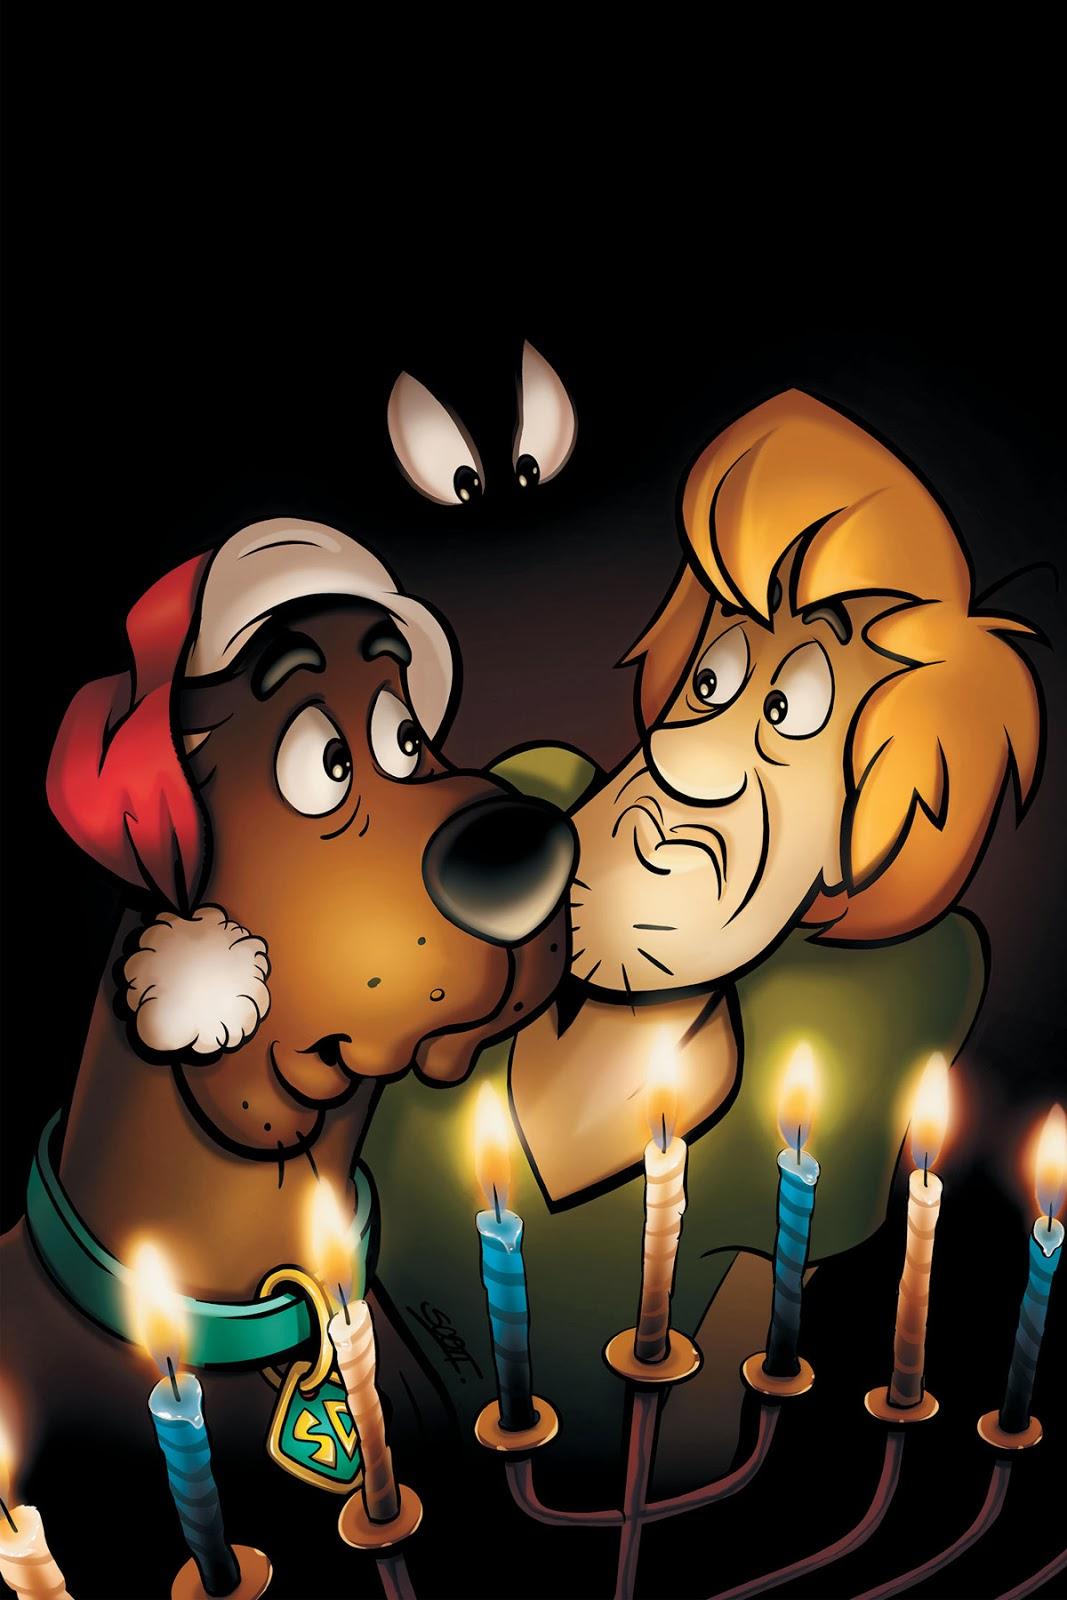 Scooby Doo Wallpaper HD - WallpaperSafari